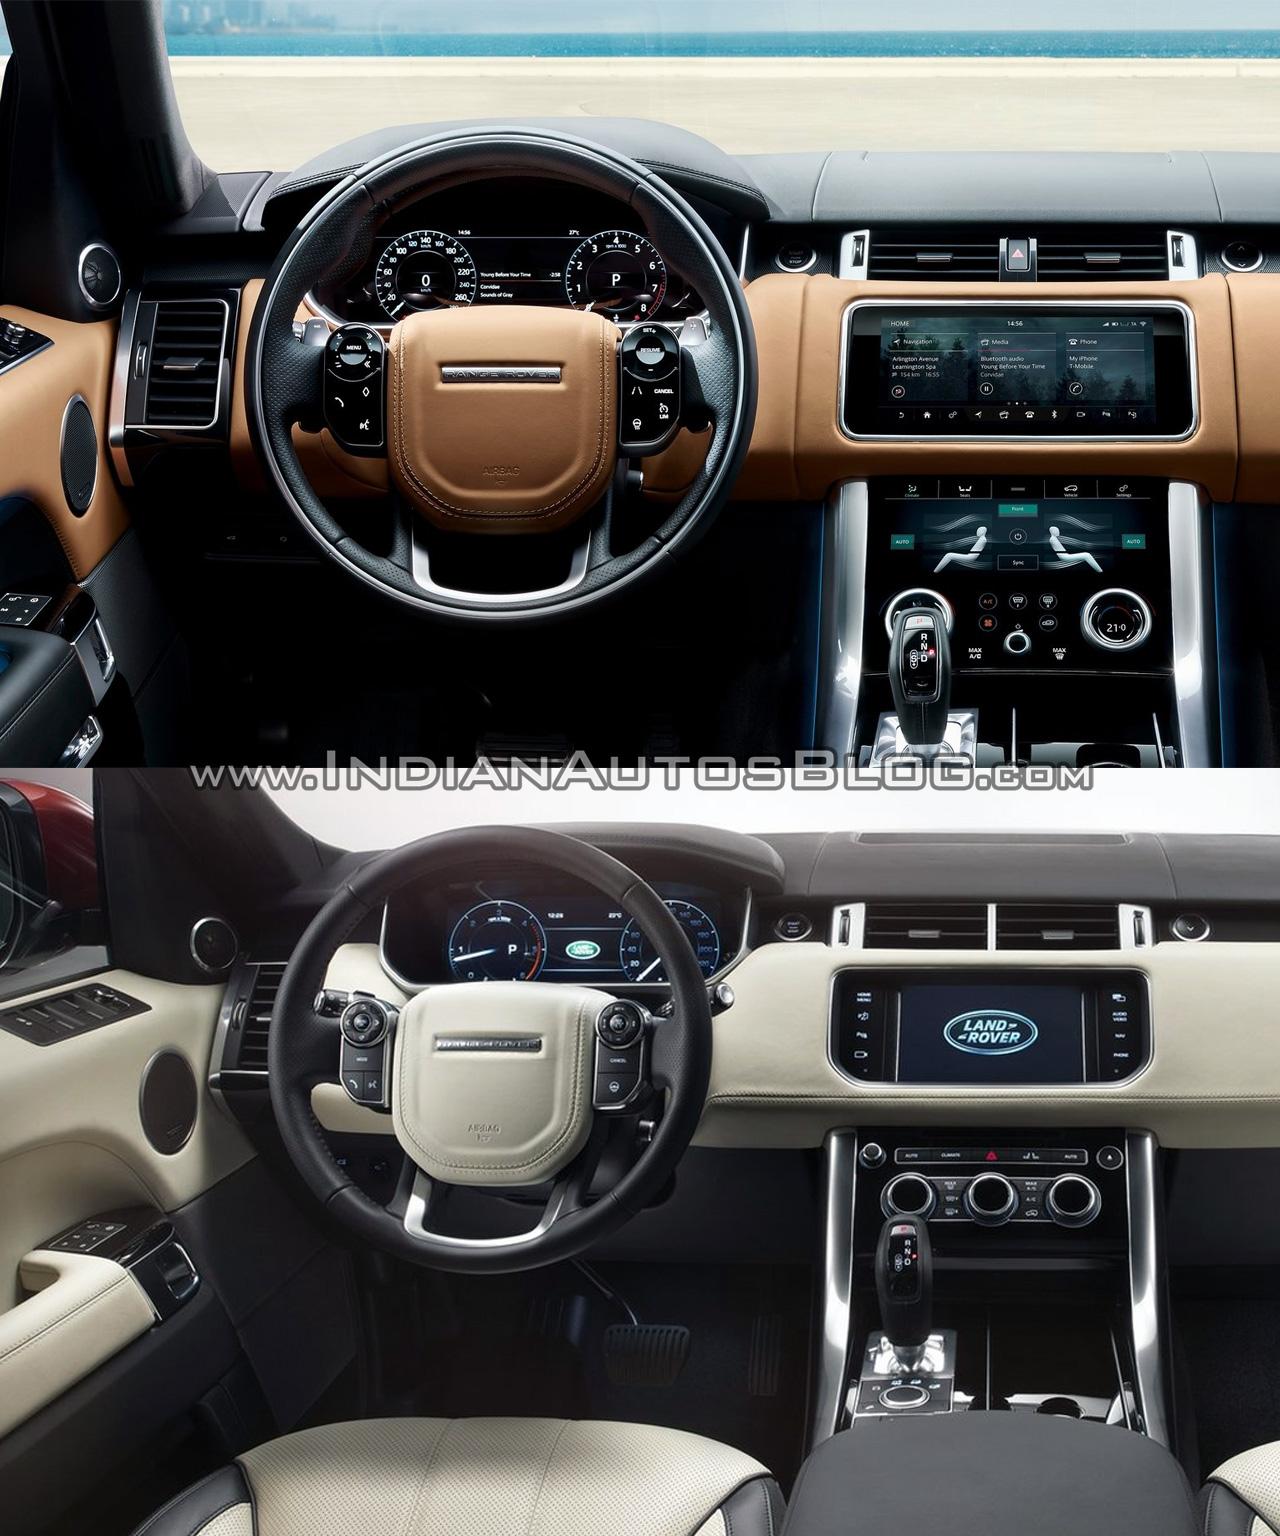 2018 Range Rover Sport vs. 2014 Range Rover Sport dashboard driver side